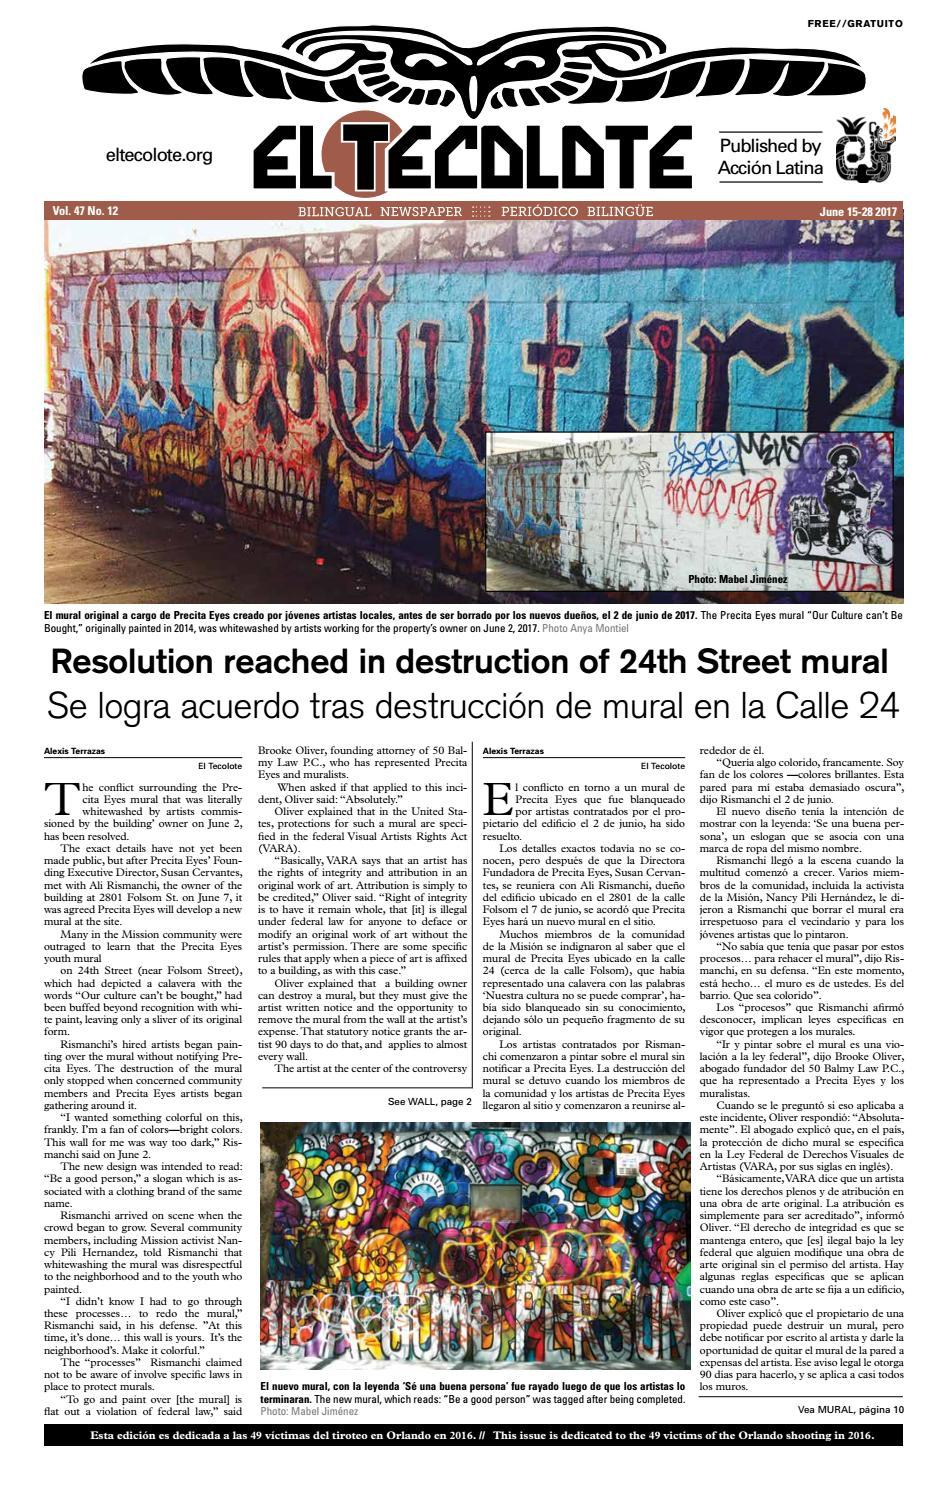 El Tecolote Vol 47 Issue 12 By El Tecolote Issuu